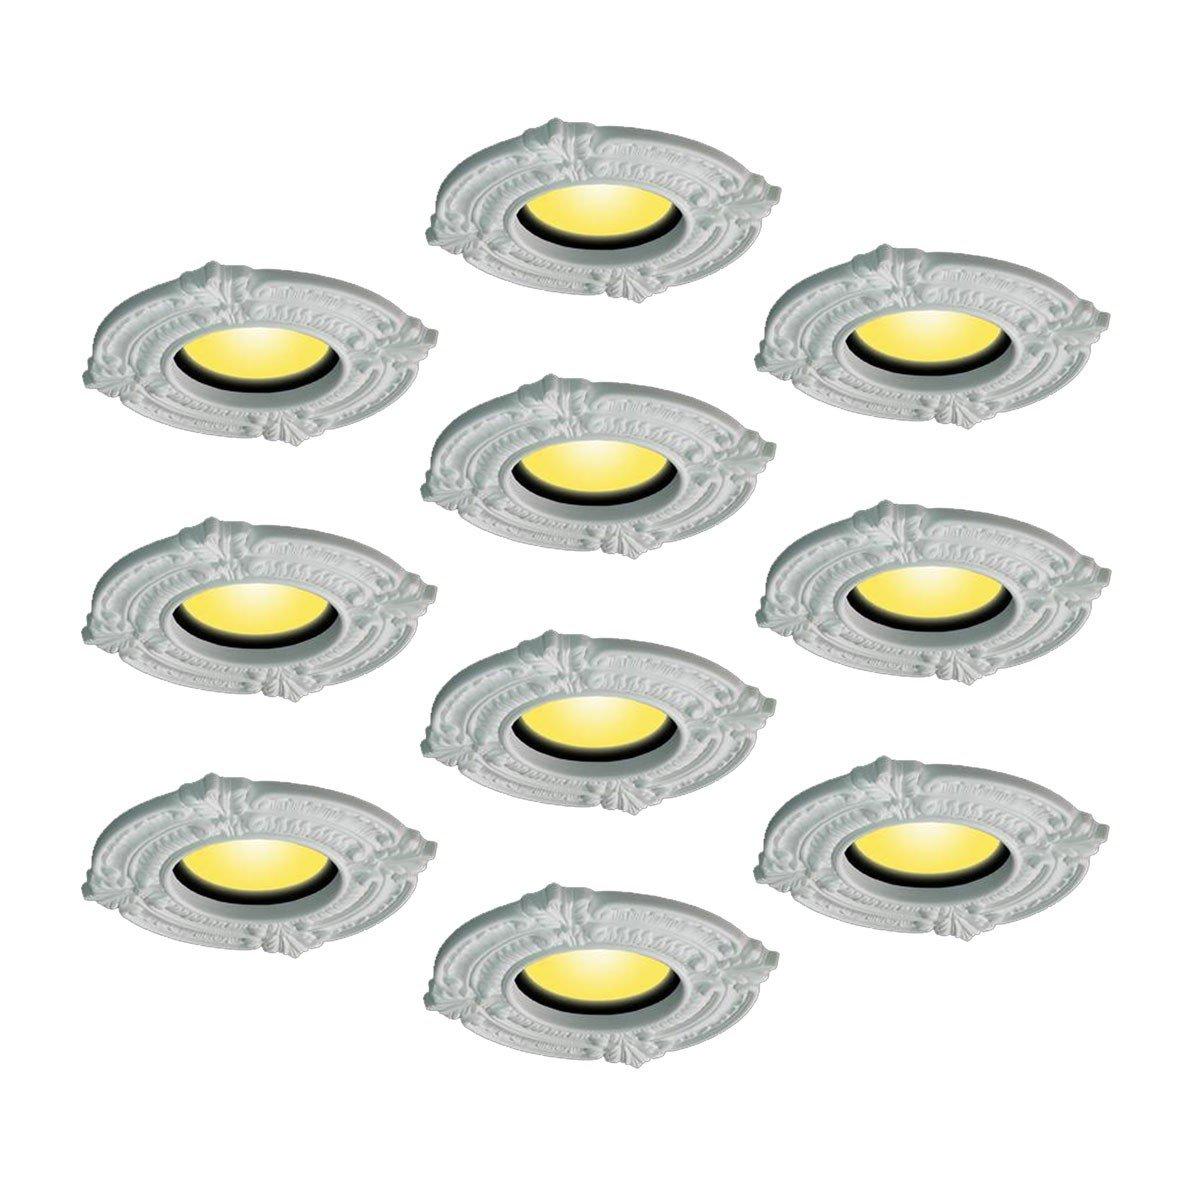 10 Spot Light Trim Medallions 6'' ID Urethane White Set Of 10 | Renovator's Supply